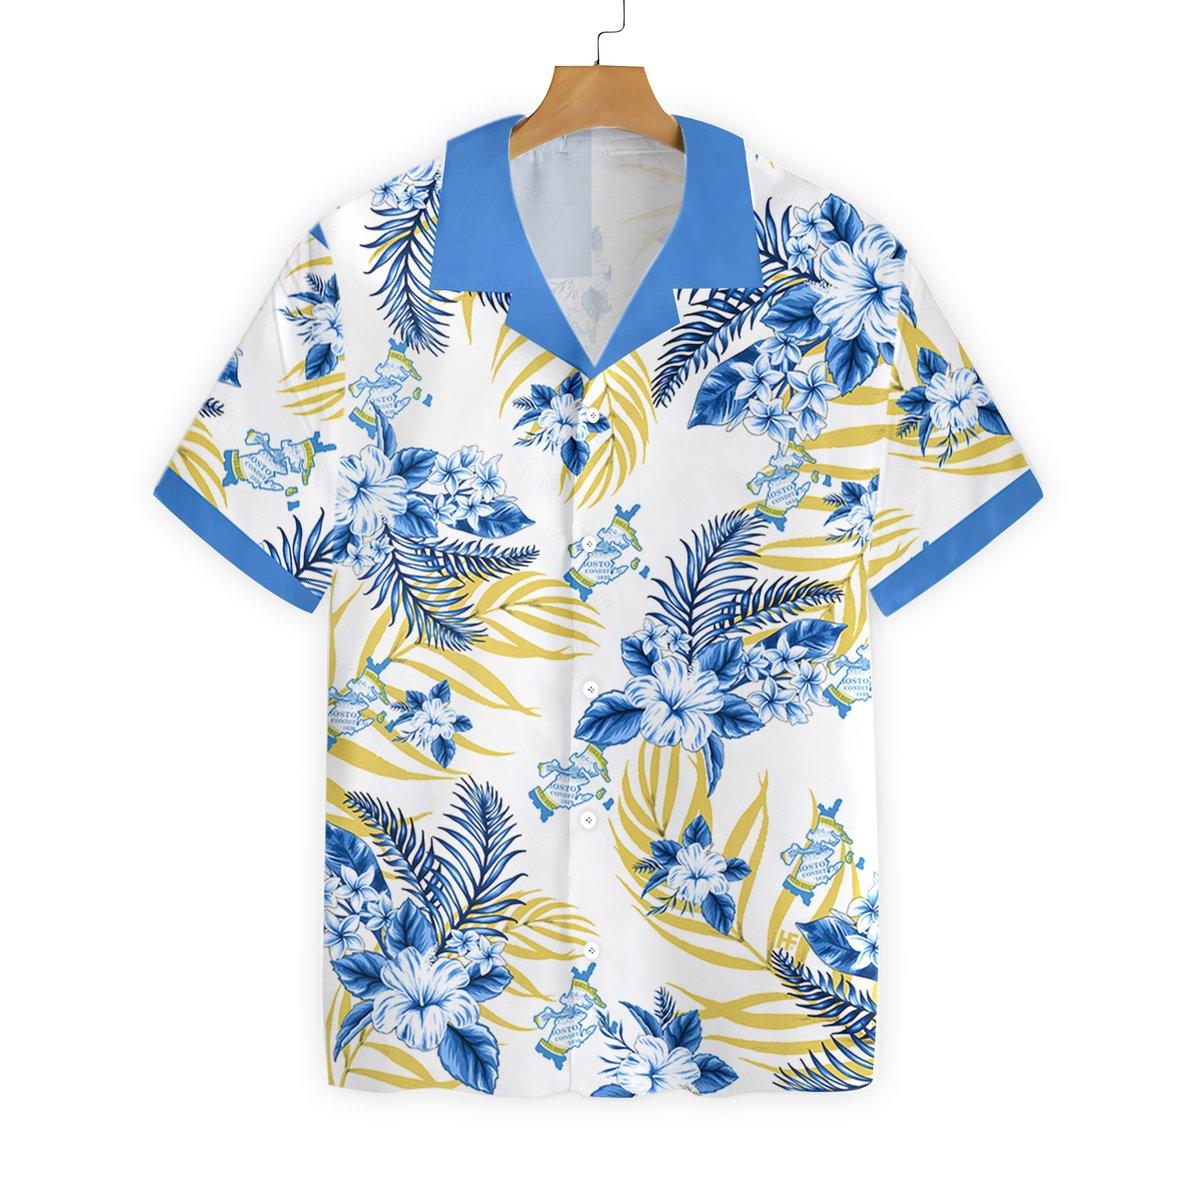 TOP HOT HAWAIIAN SHIRT FOR MEN 18